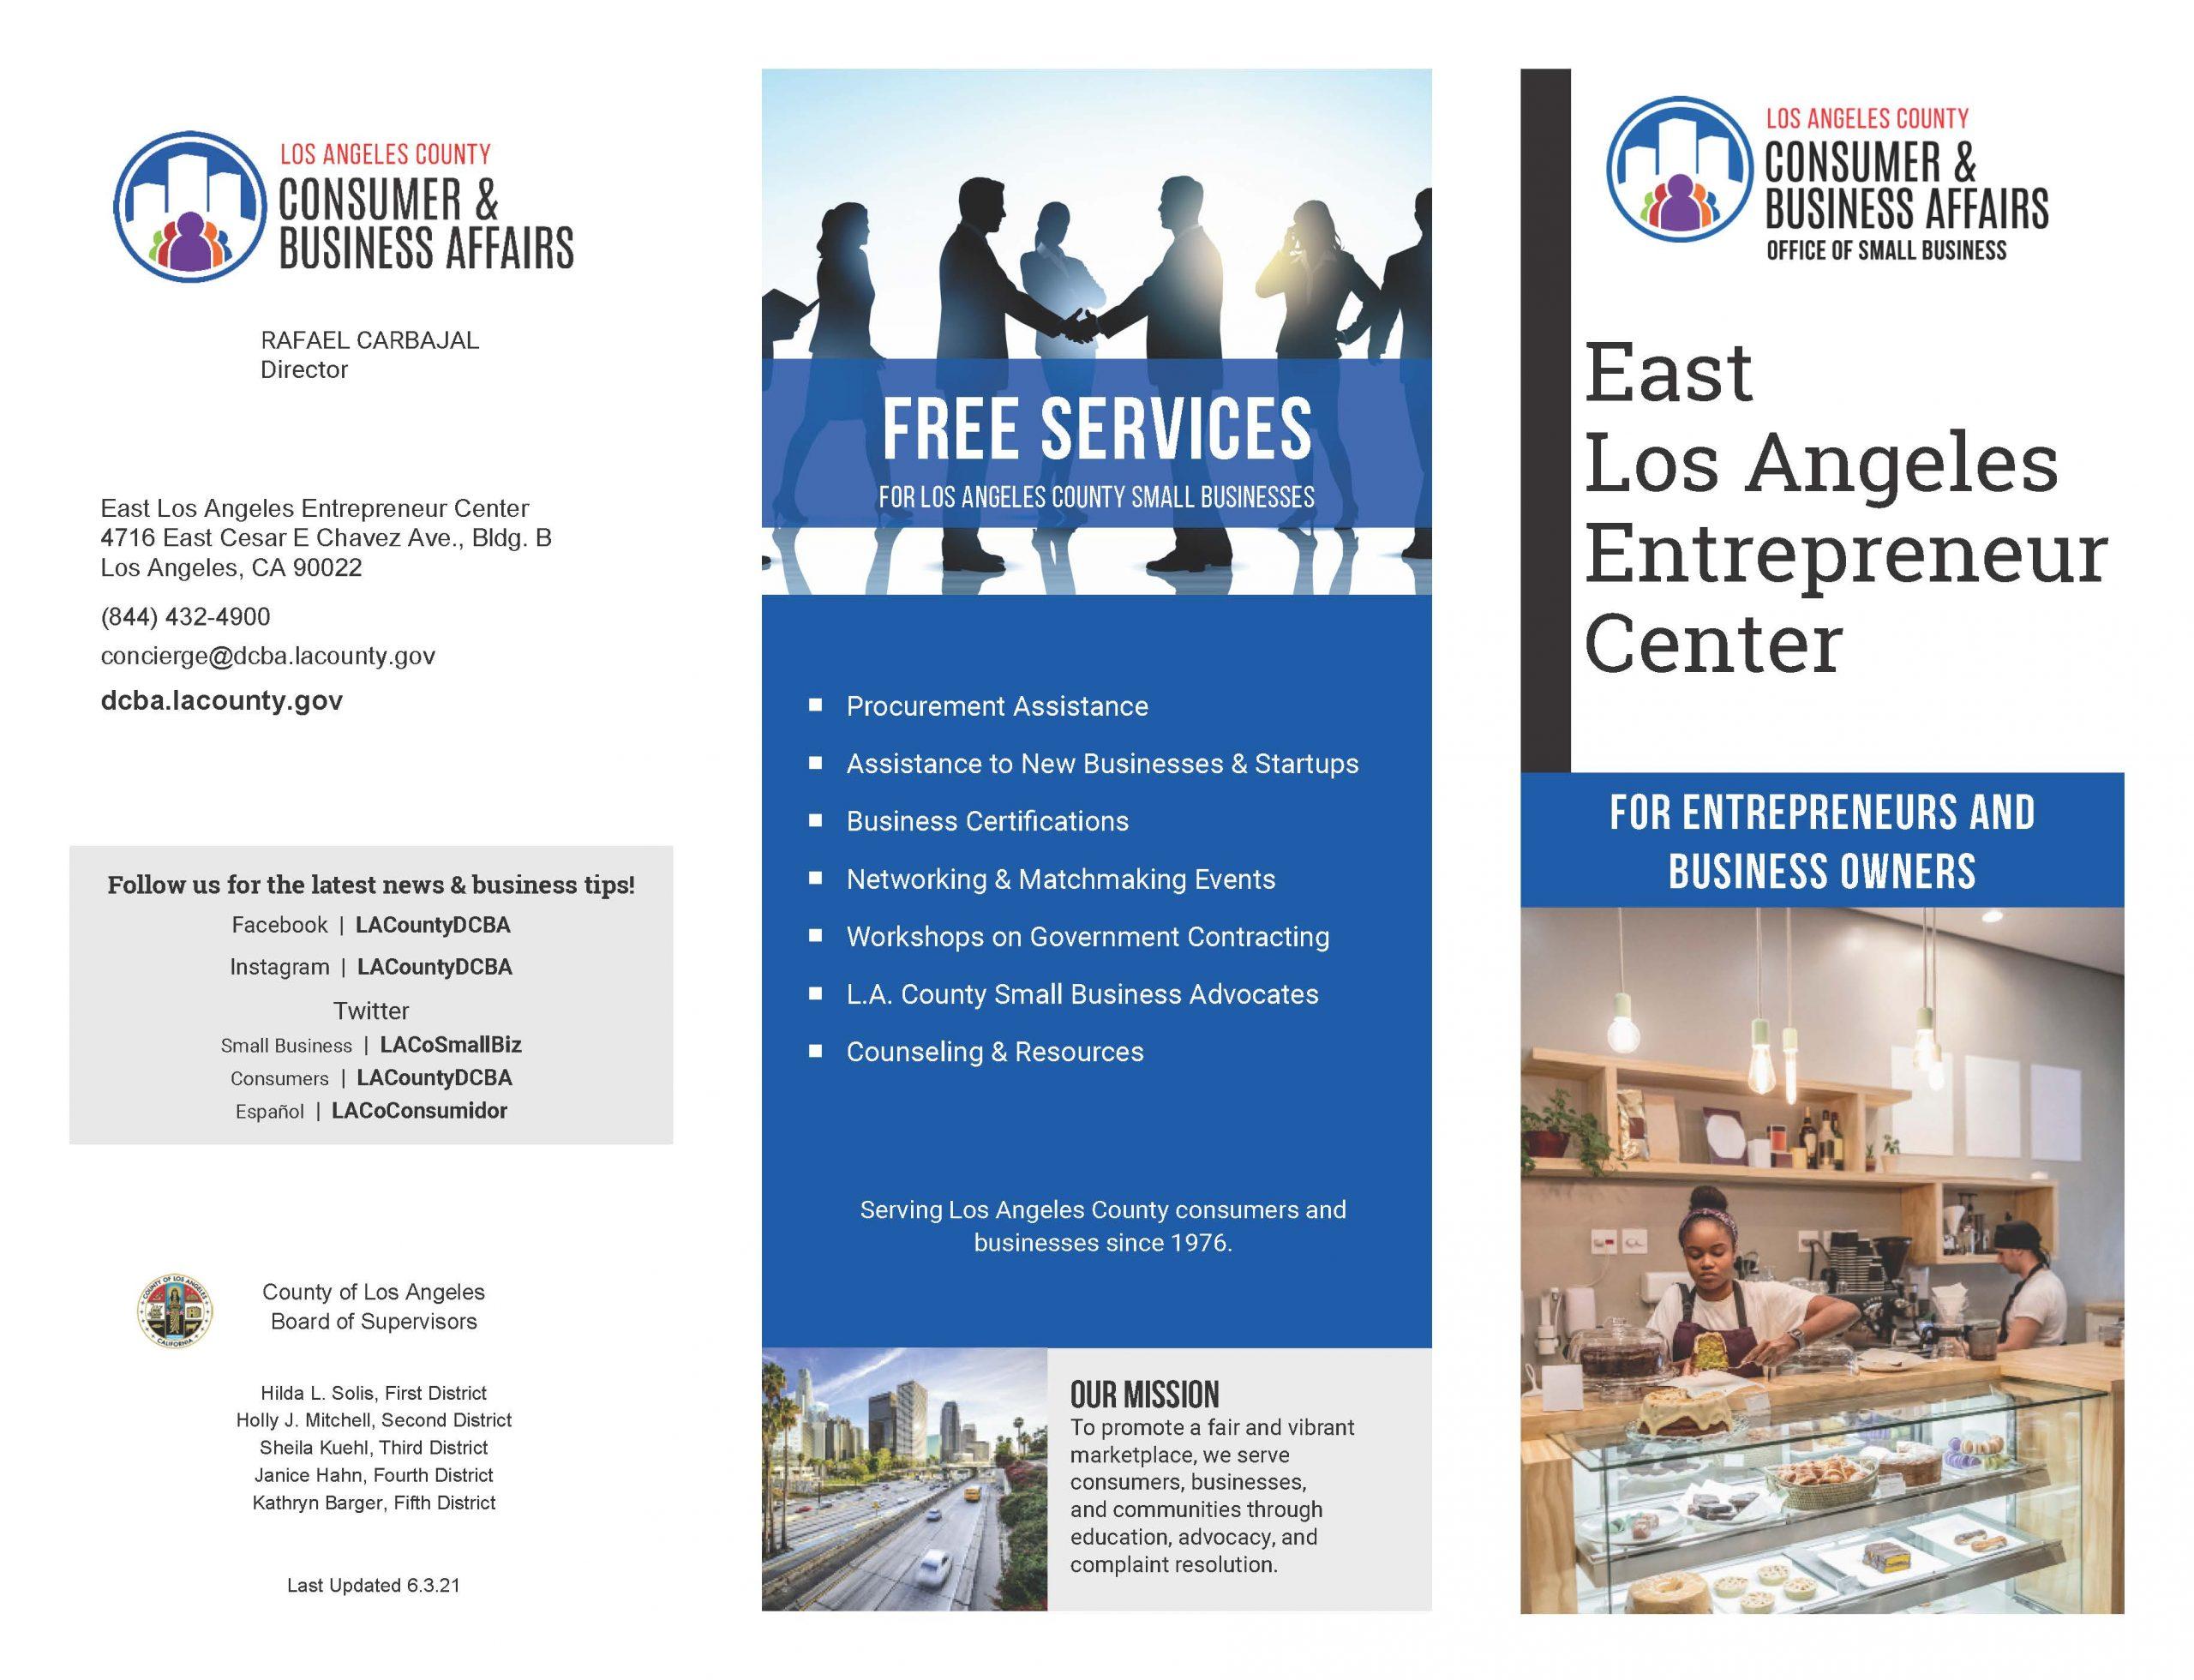 Image of the East LA Entrepreneur Center brochure